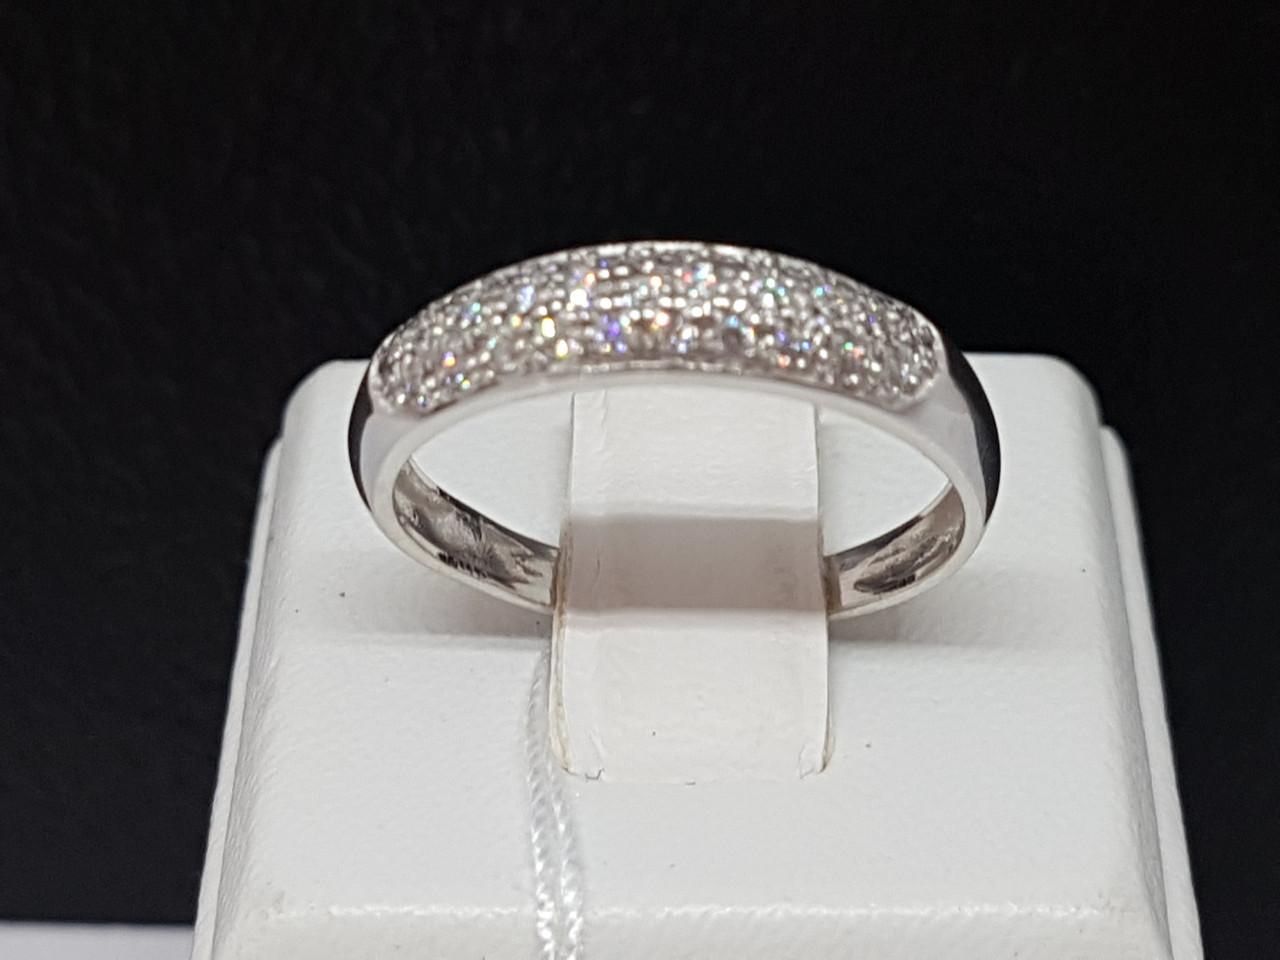 Серебряное кольцо Калинка с фианитами. Артикул 1246Р-CZ 16